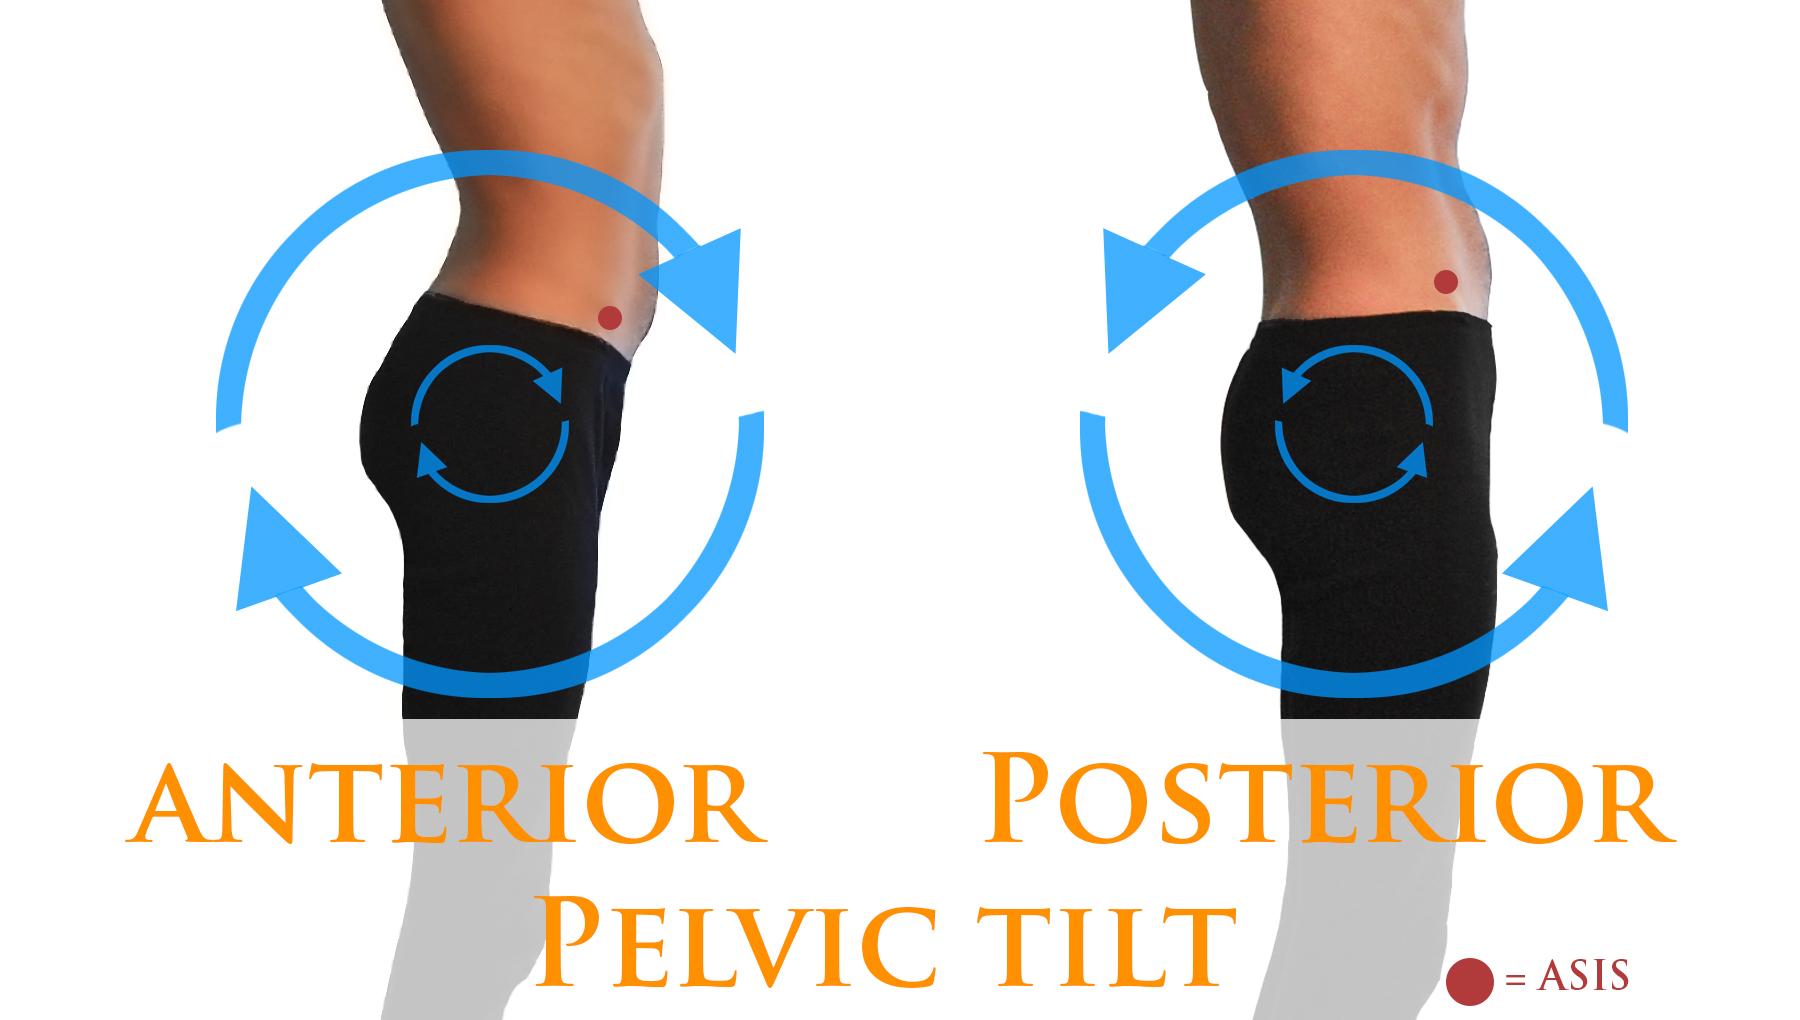 Pelvic Tilt 3 Inches In 1 Week